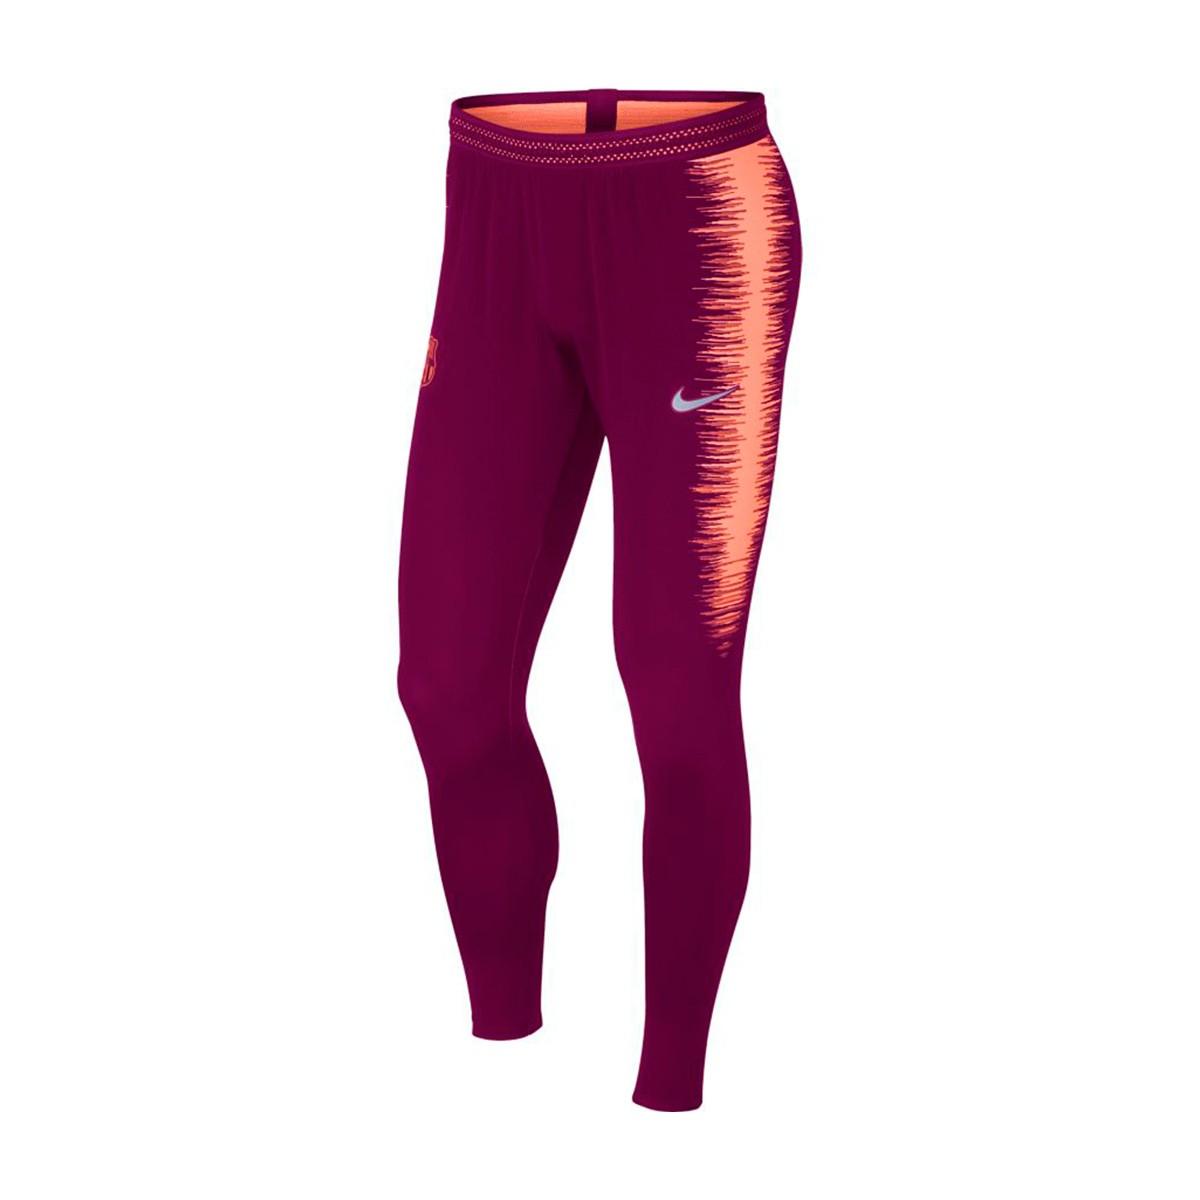 Pantalon Largo Nike Vaporknit Strike Fc Barcelona 2018 2019 Deep Maroon Light Atomic Pink Futbol Emotion